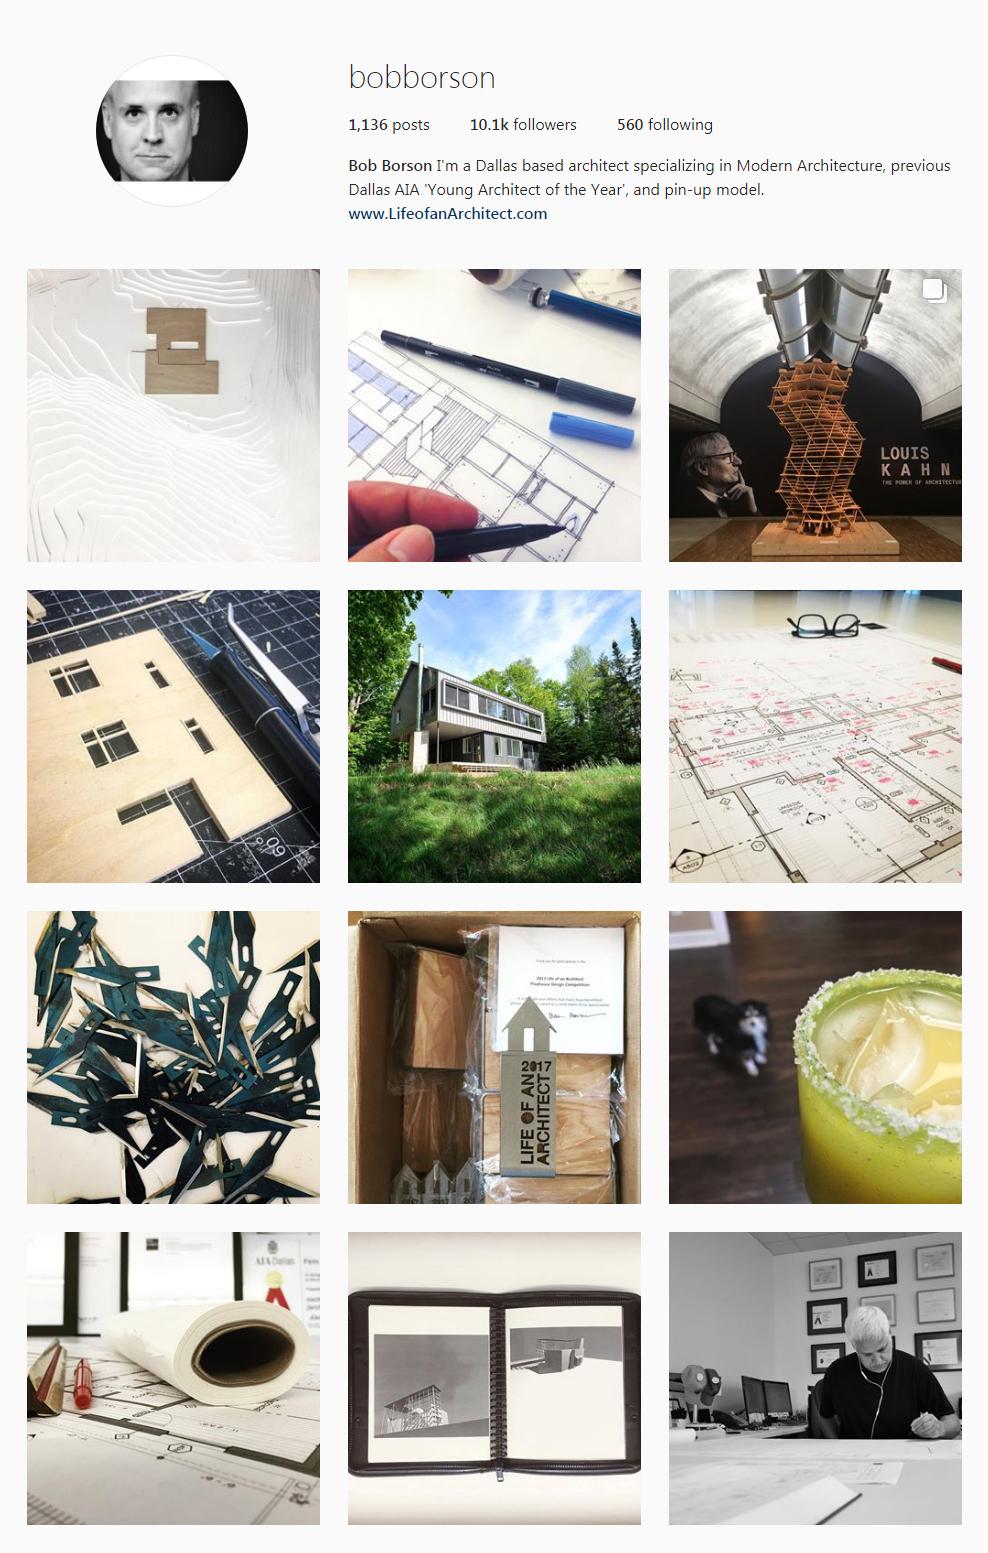 Best Architectural Instagram Feeds of 2017 - Bob Borson